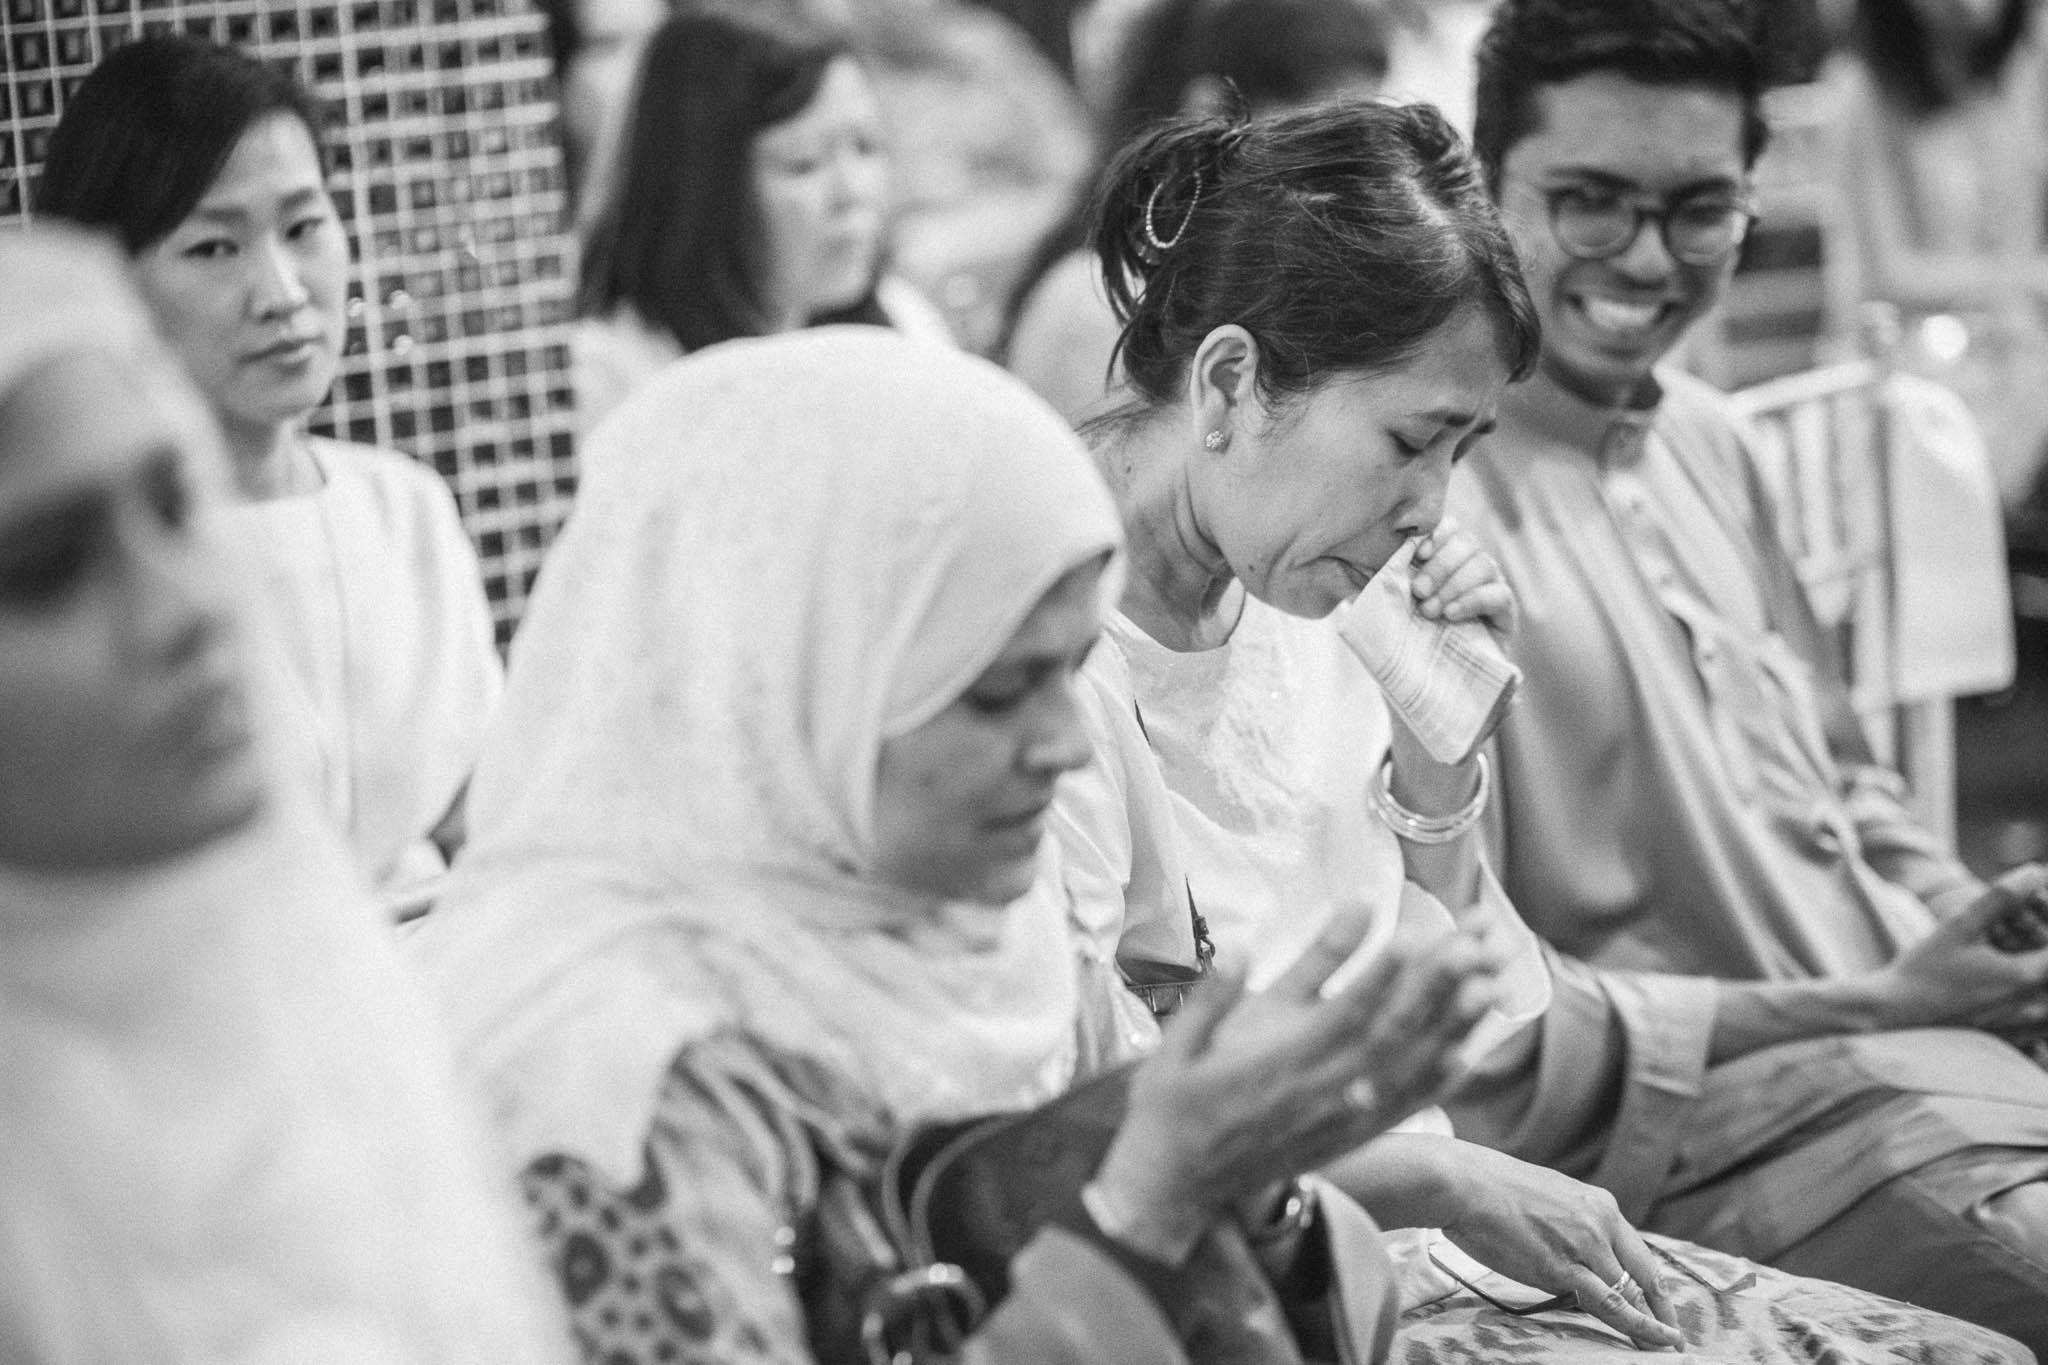 singapore-wedding-photographer-malay-indian-pre-wedding-travel-wmt-2015-shereen-farid-30.jpg